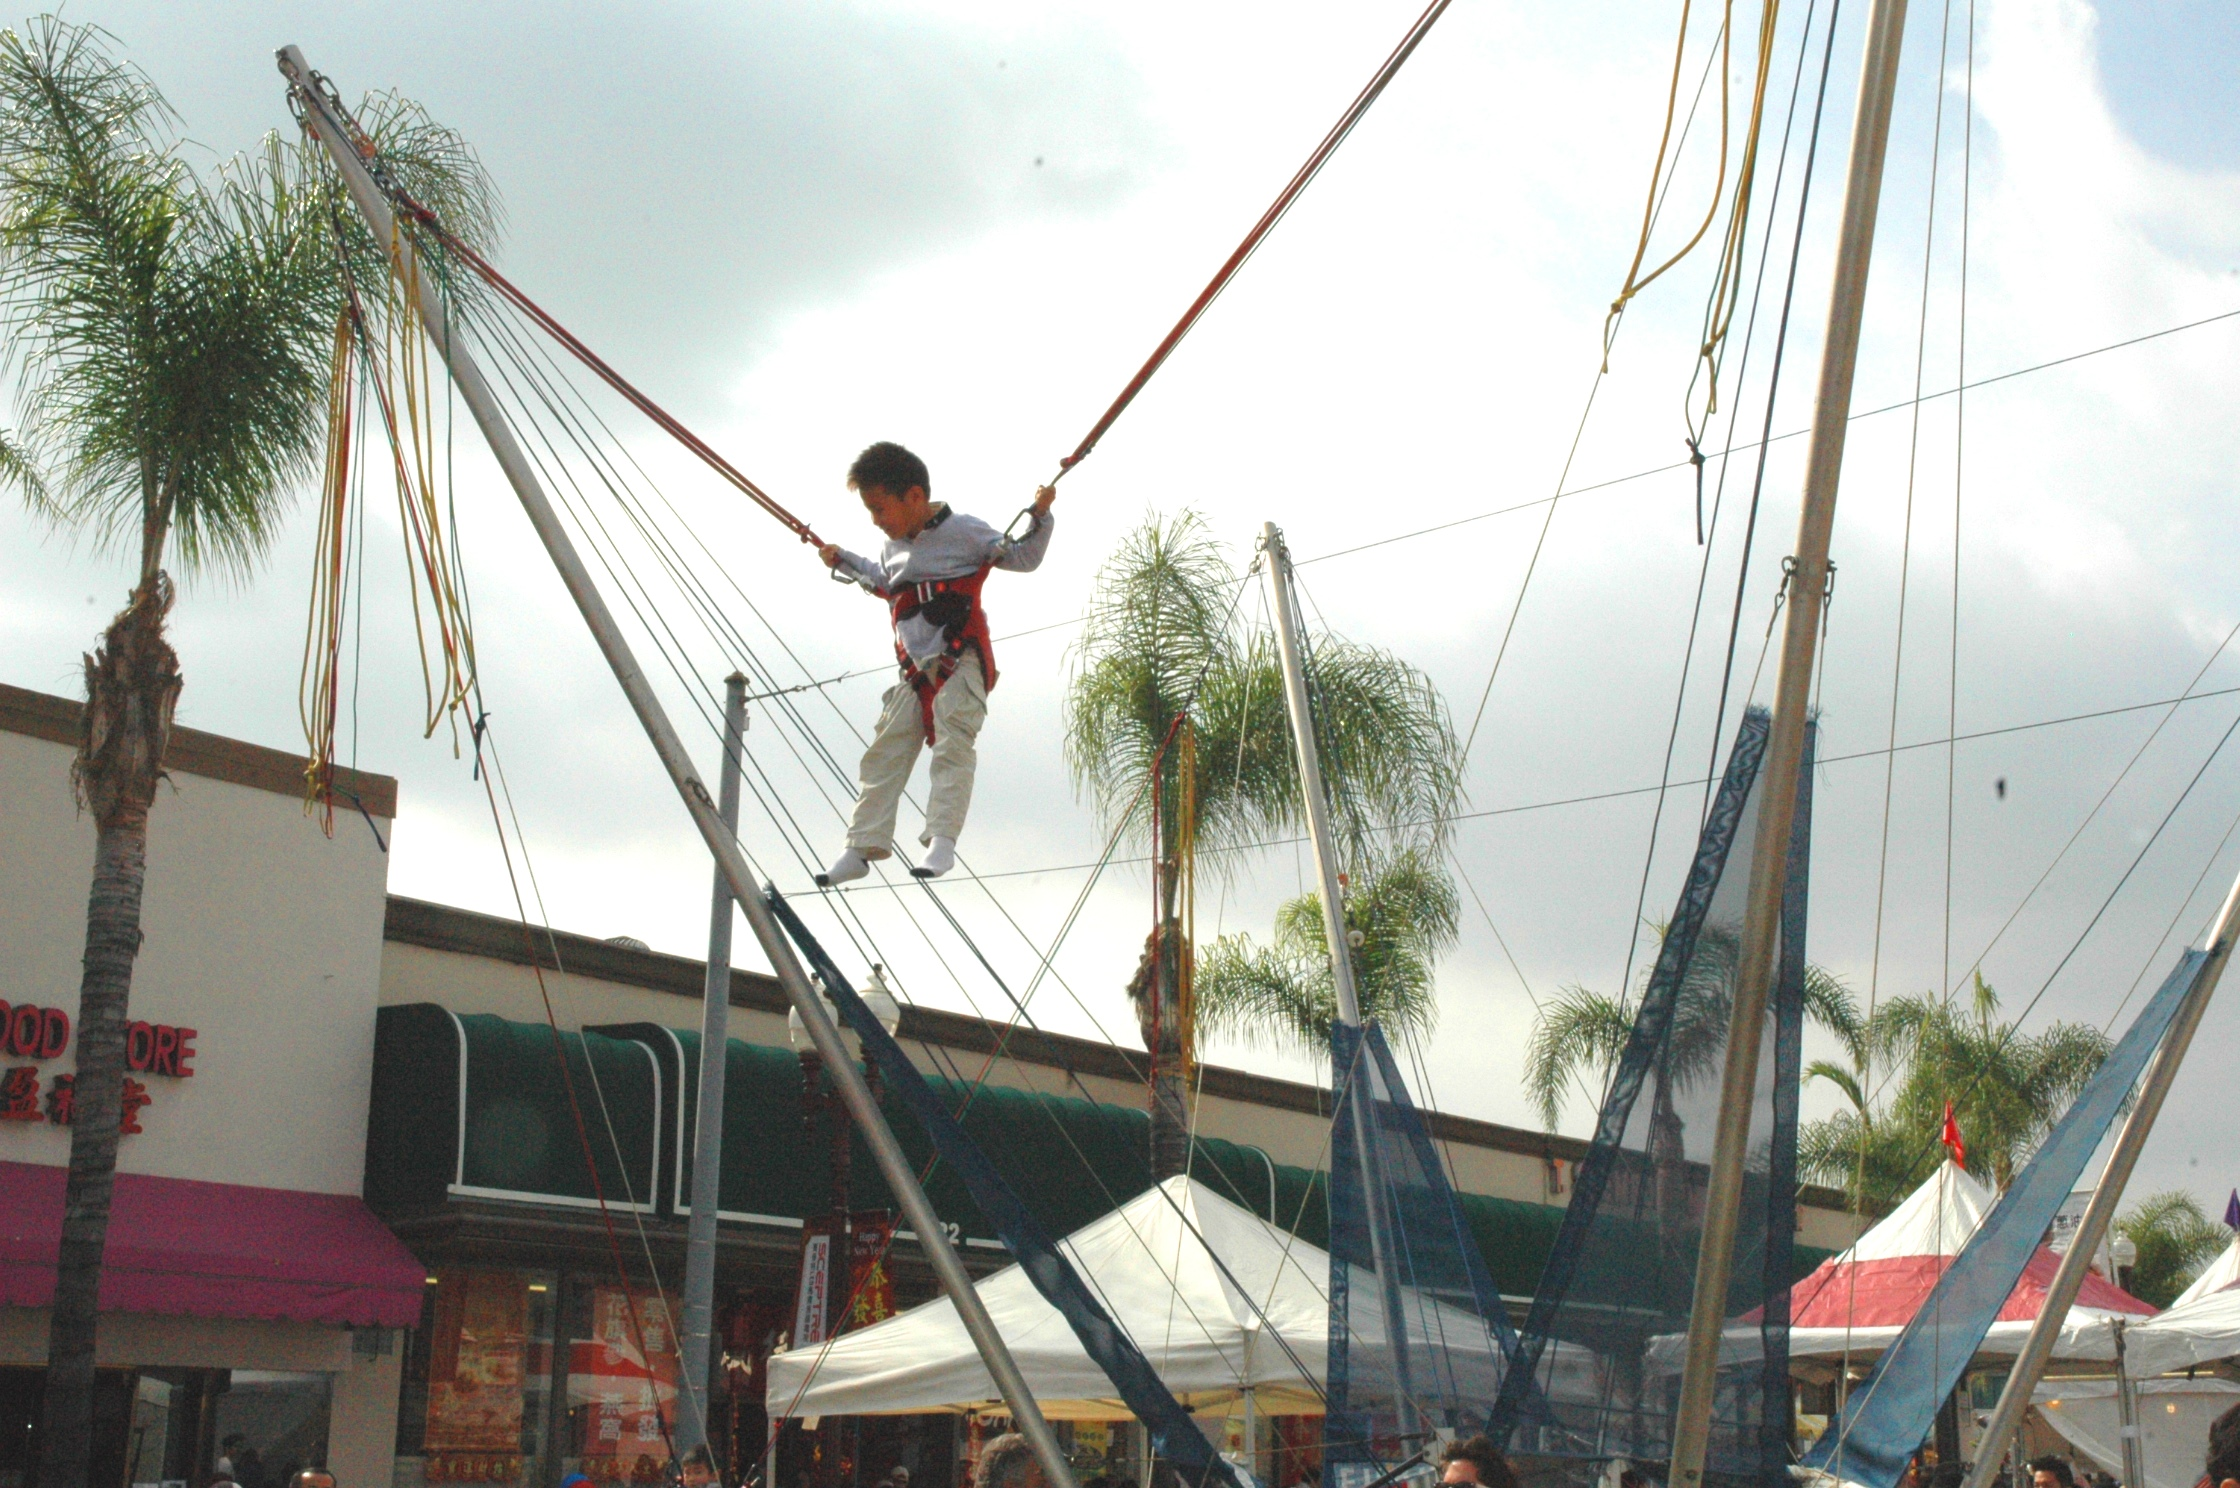 Bungee jump fun for kids